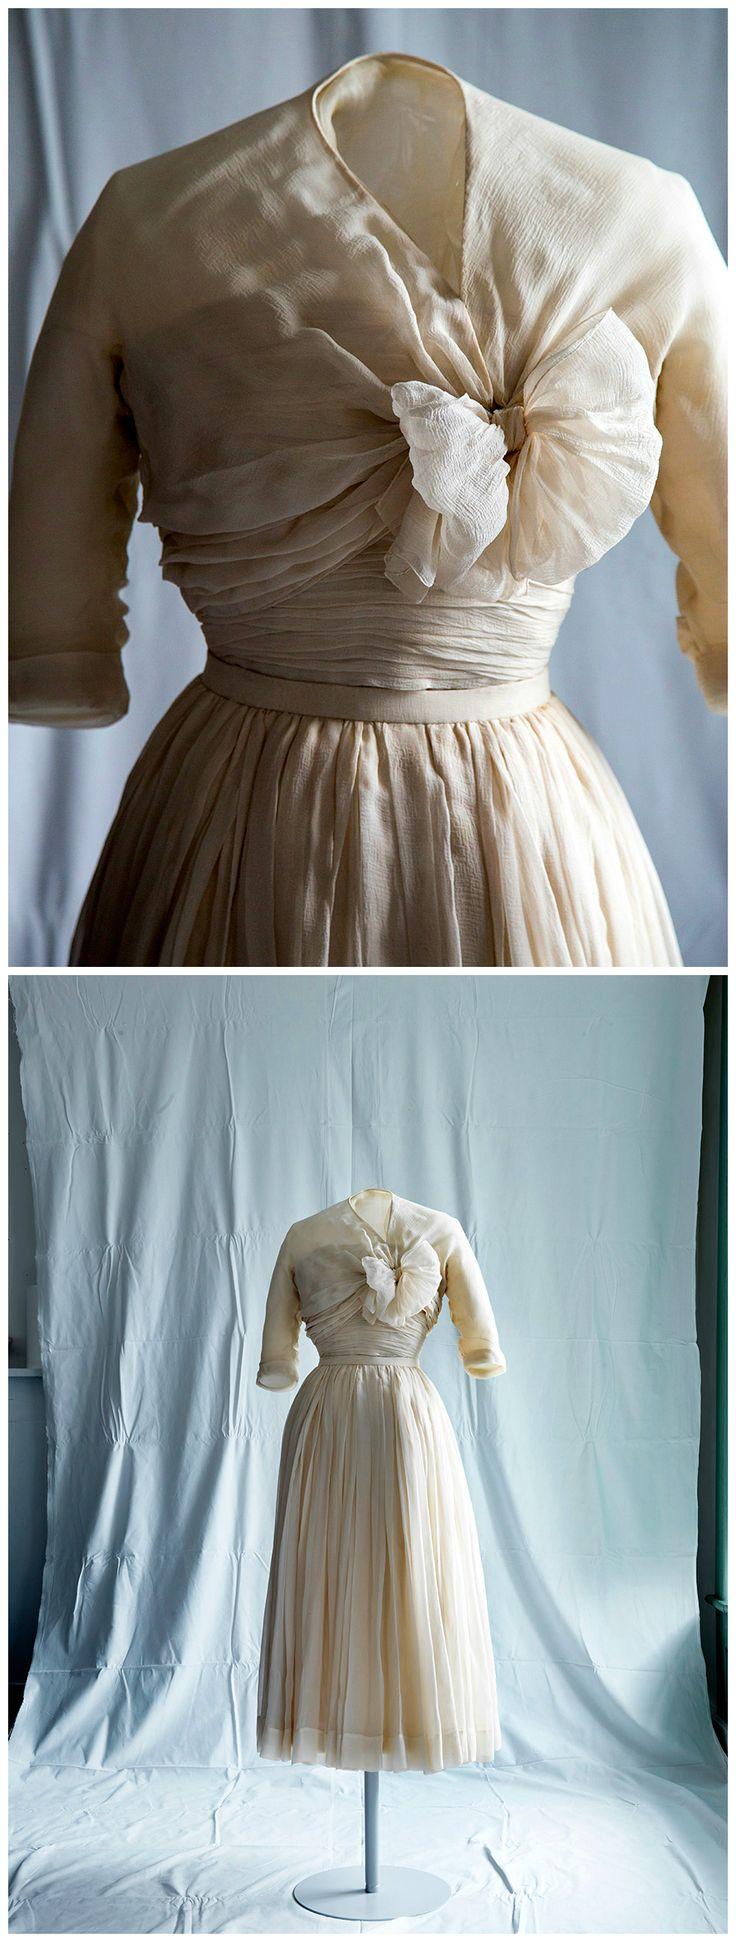 377 best The Royal Wardrobe images on Pinterest   Royalty, British ...